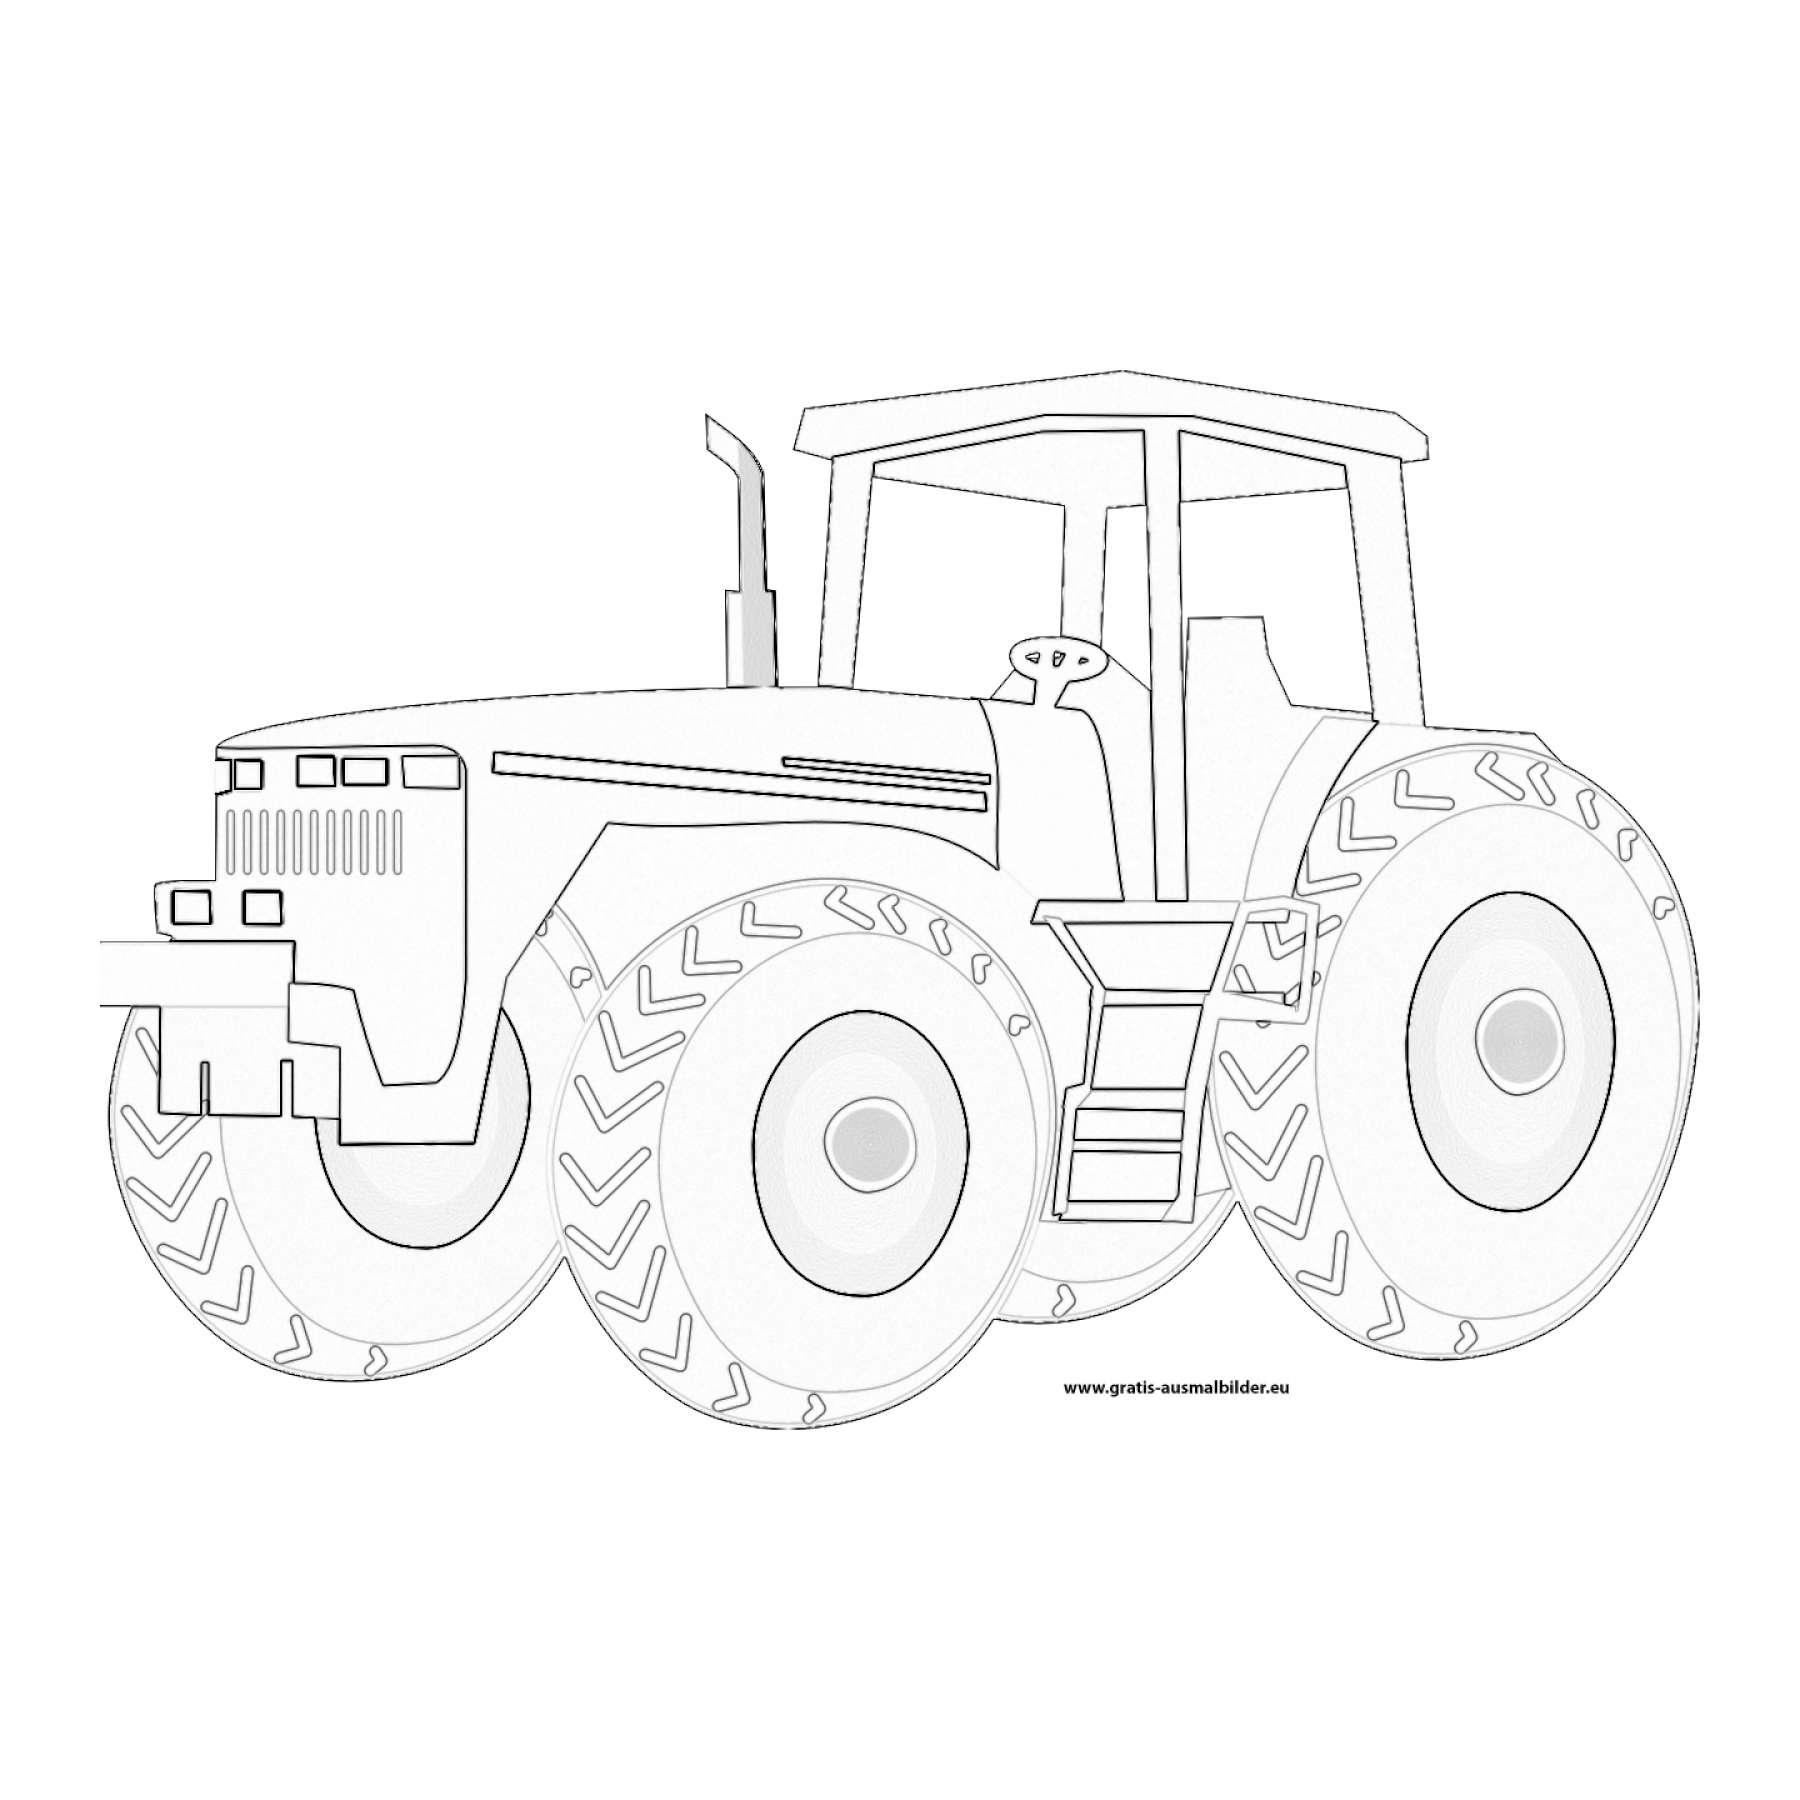 ▷ Traktor - Gratis Ausmalbild